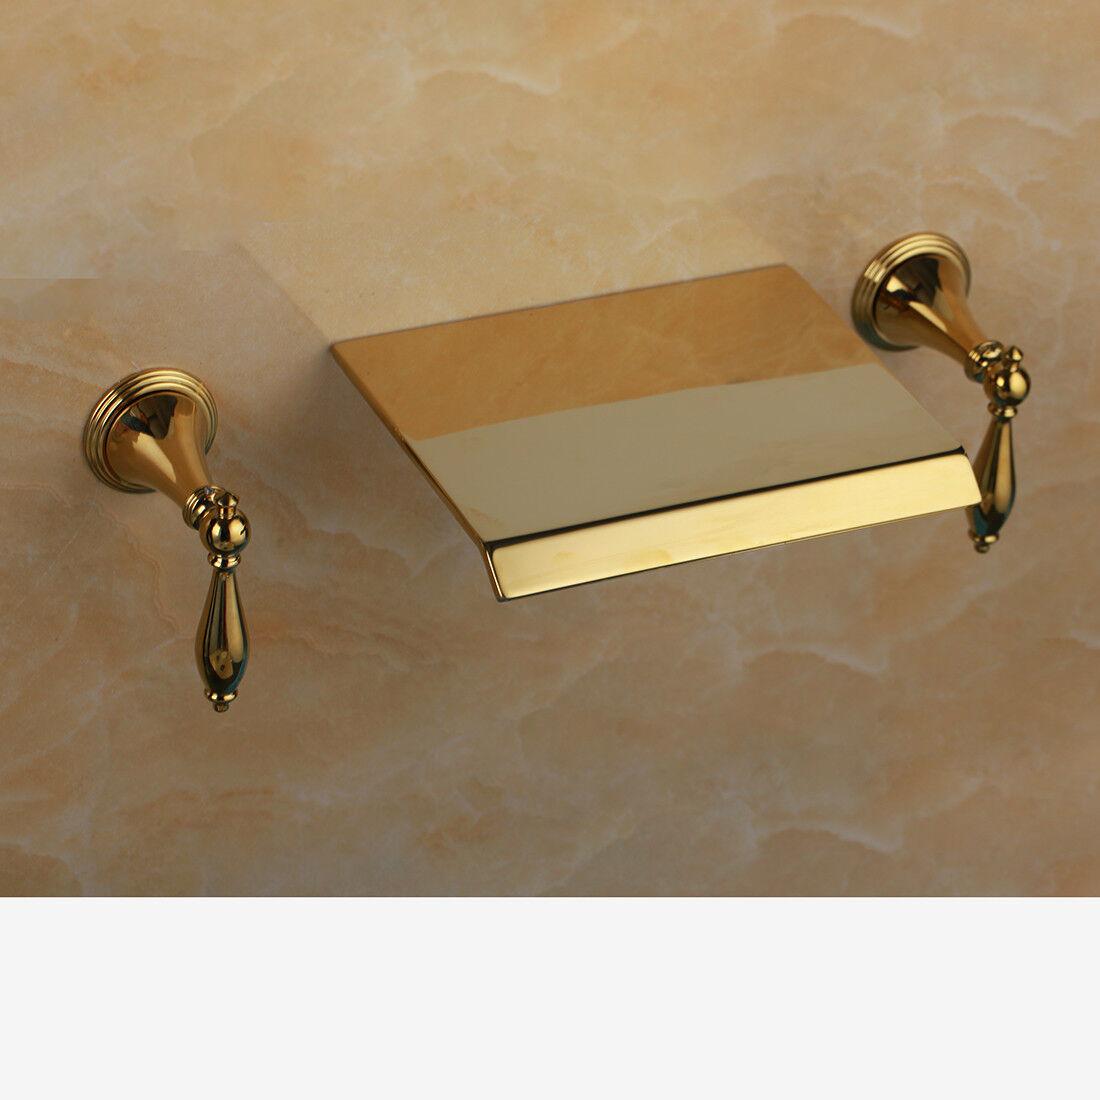 Or Support mural bain baignoire Mélangeur lavabo robinet double poignées cascade laiton robinets